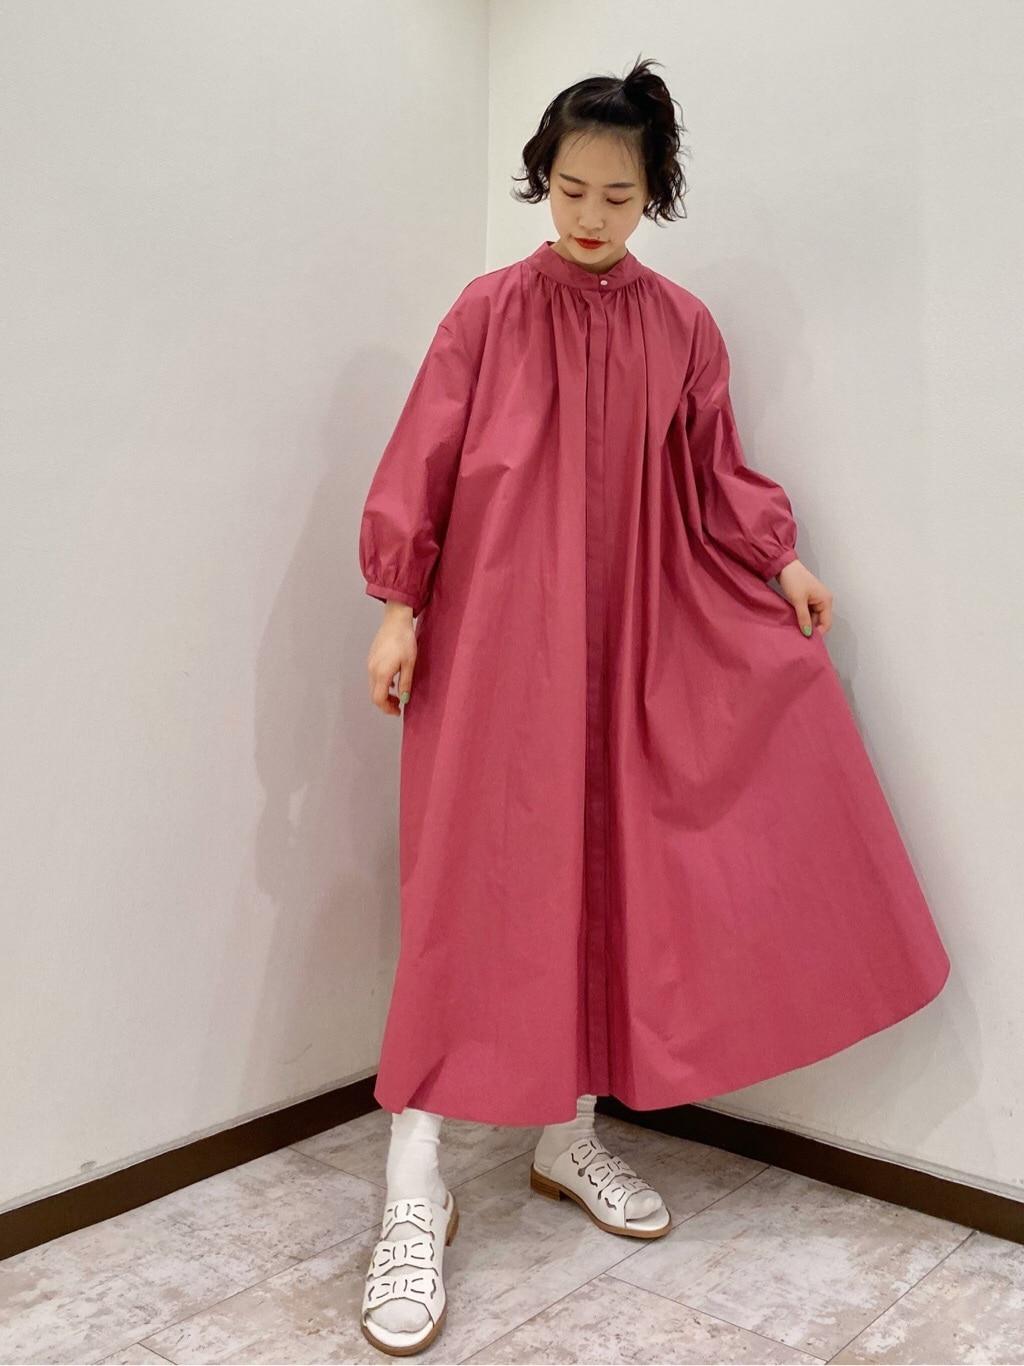 l'atelier du savon 新宿ミロード 身長:159cm 2020.04.06